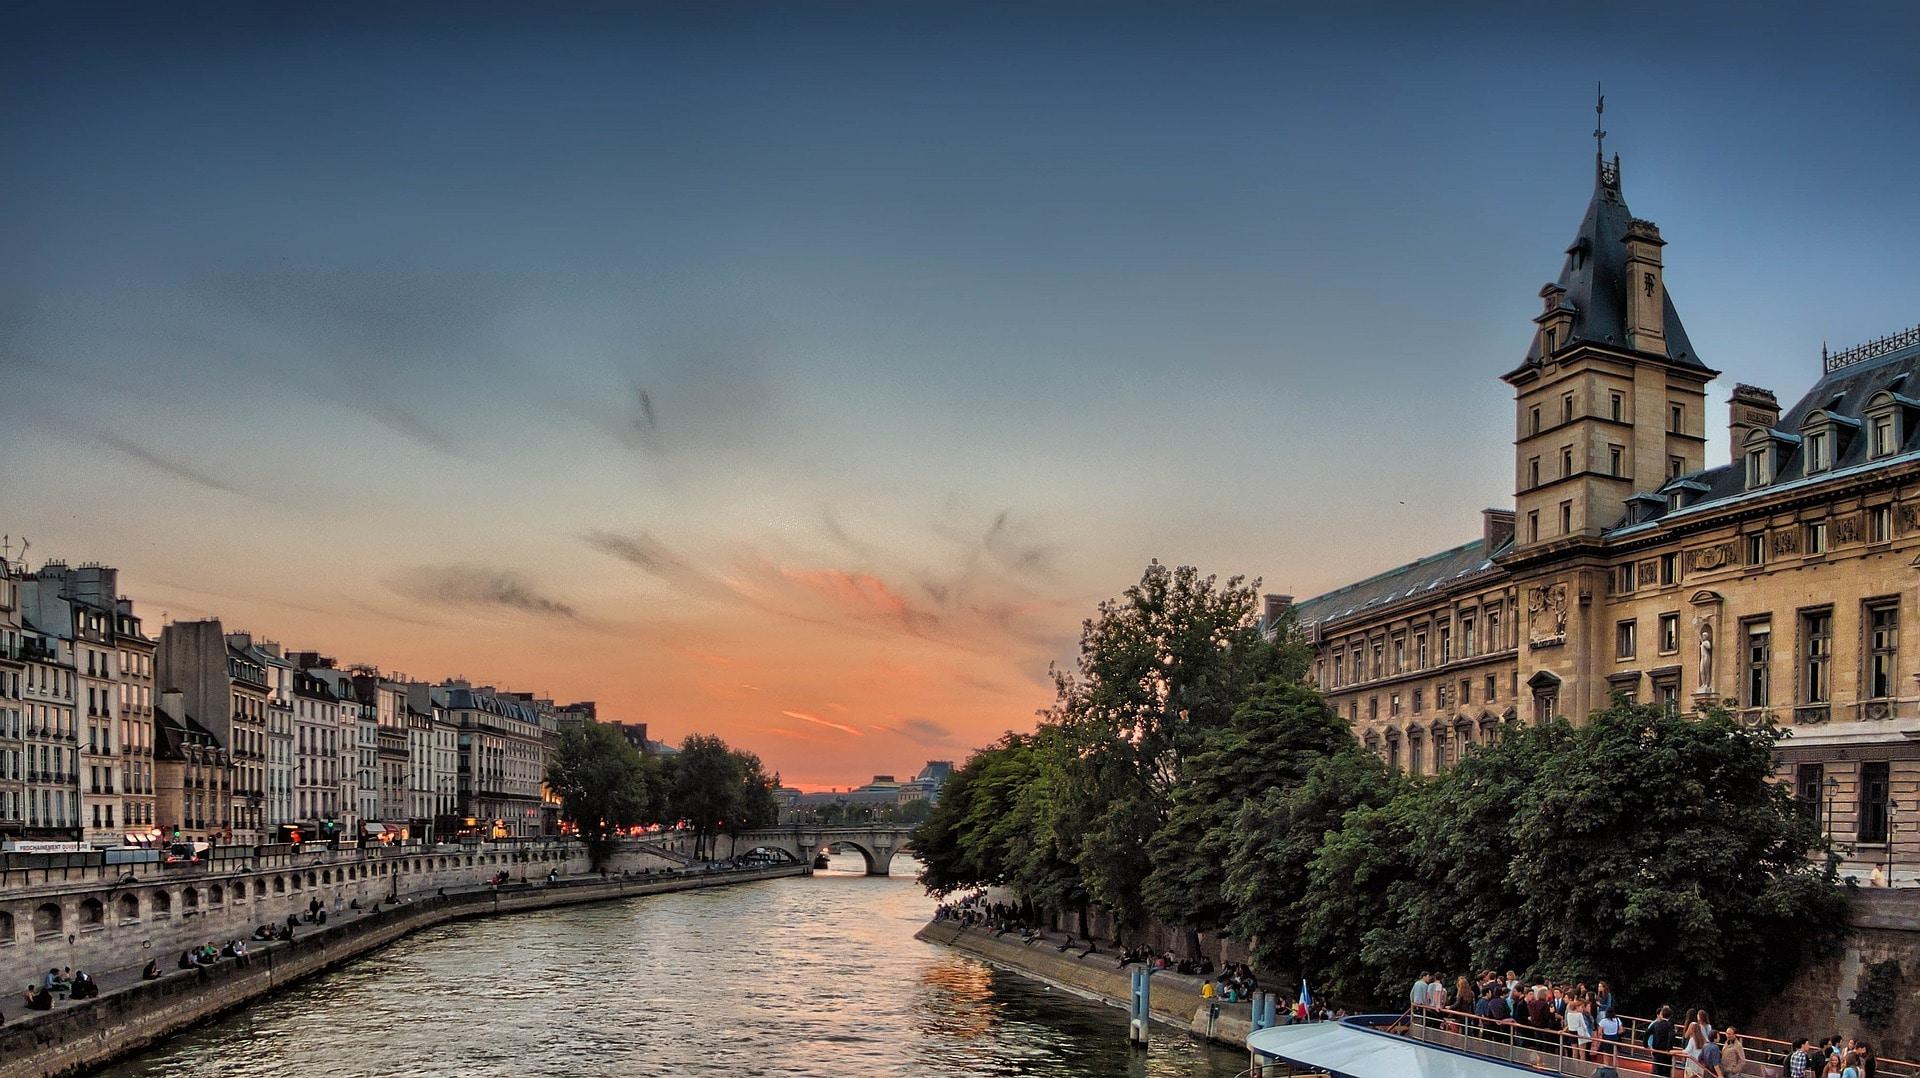 seine-river-985605_1920